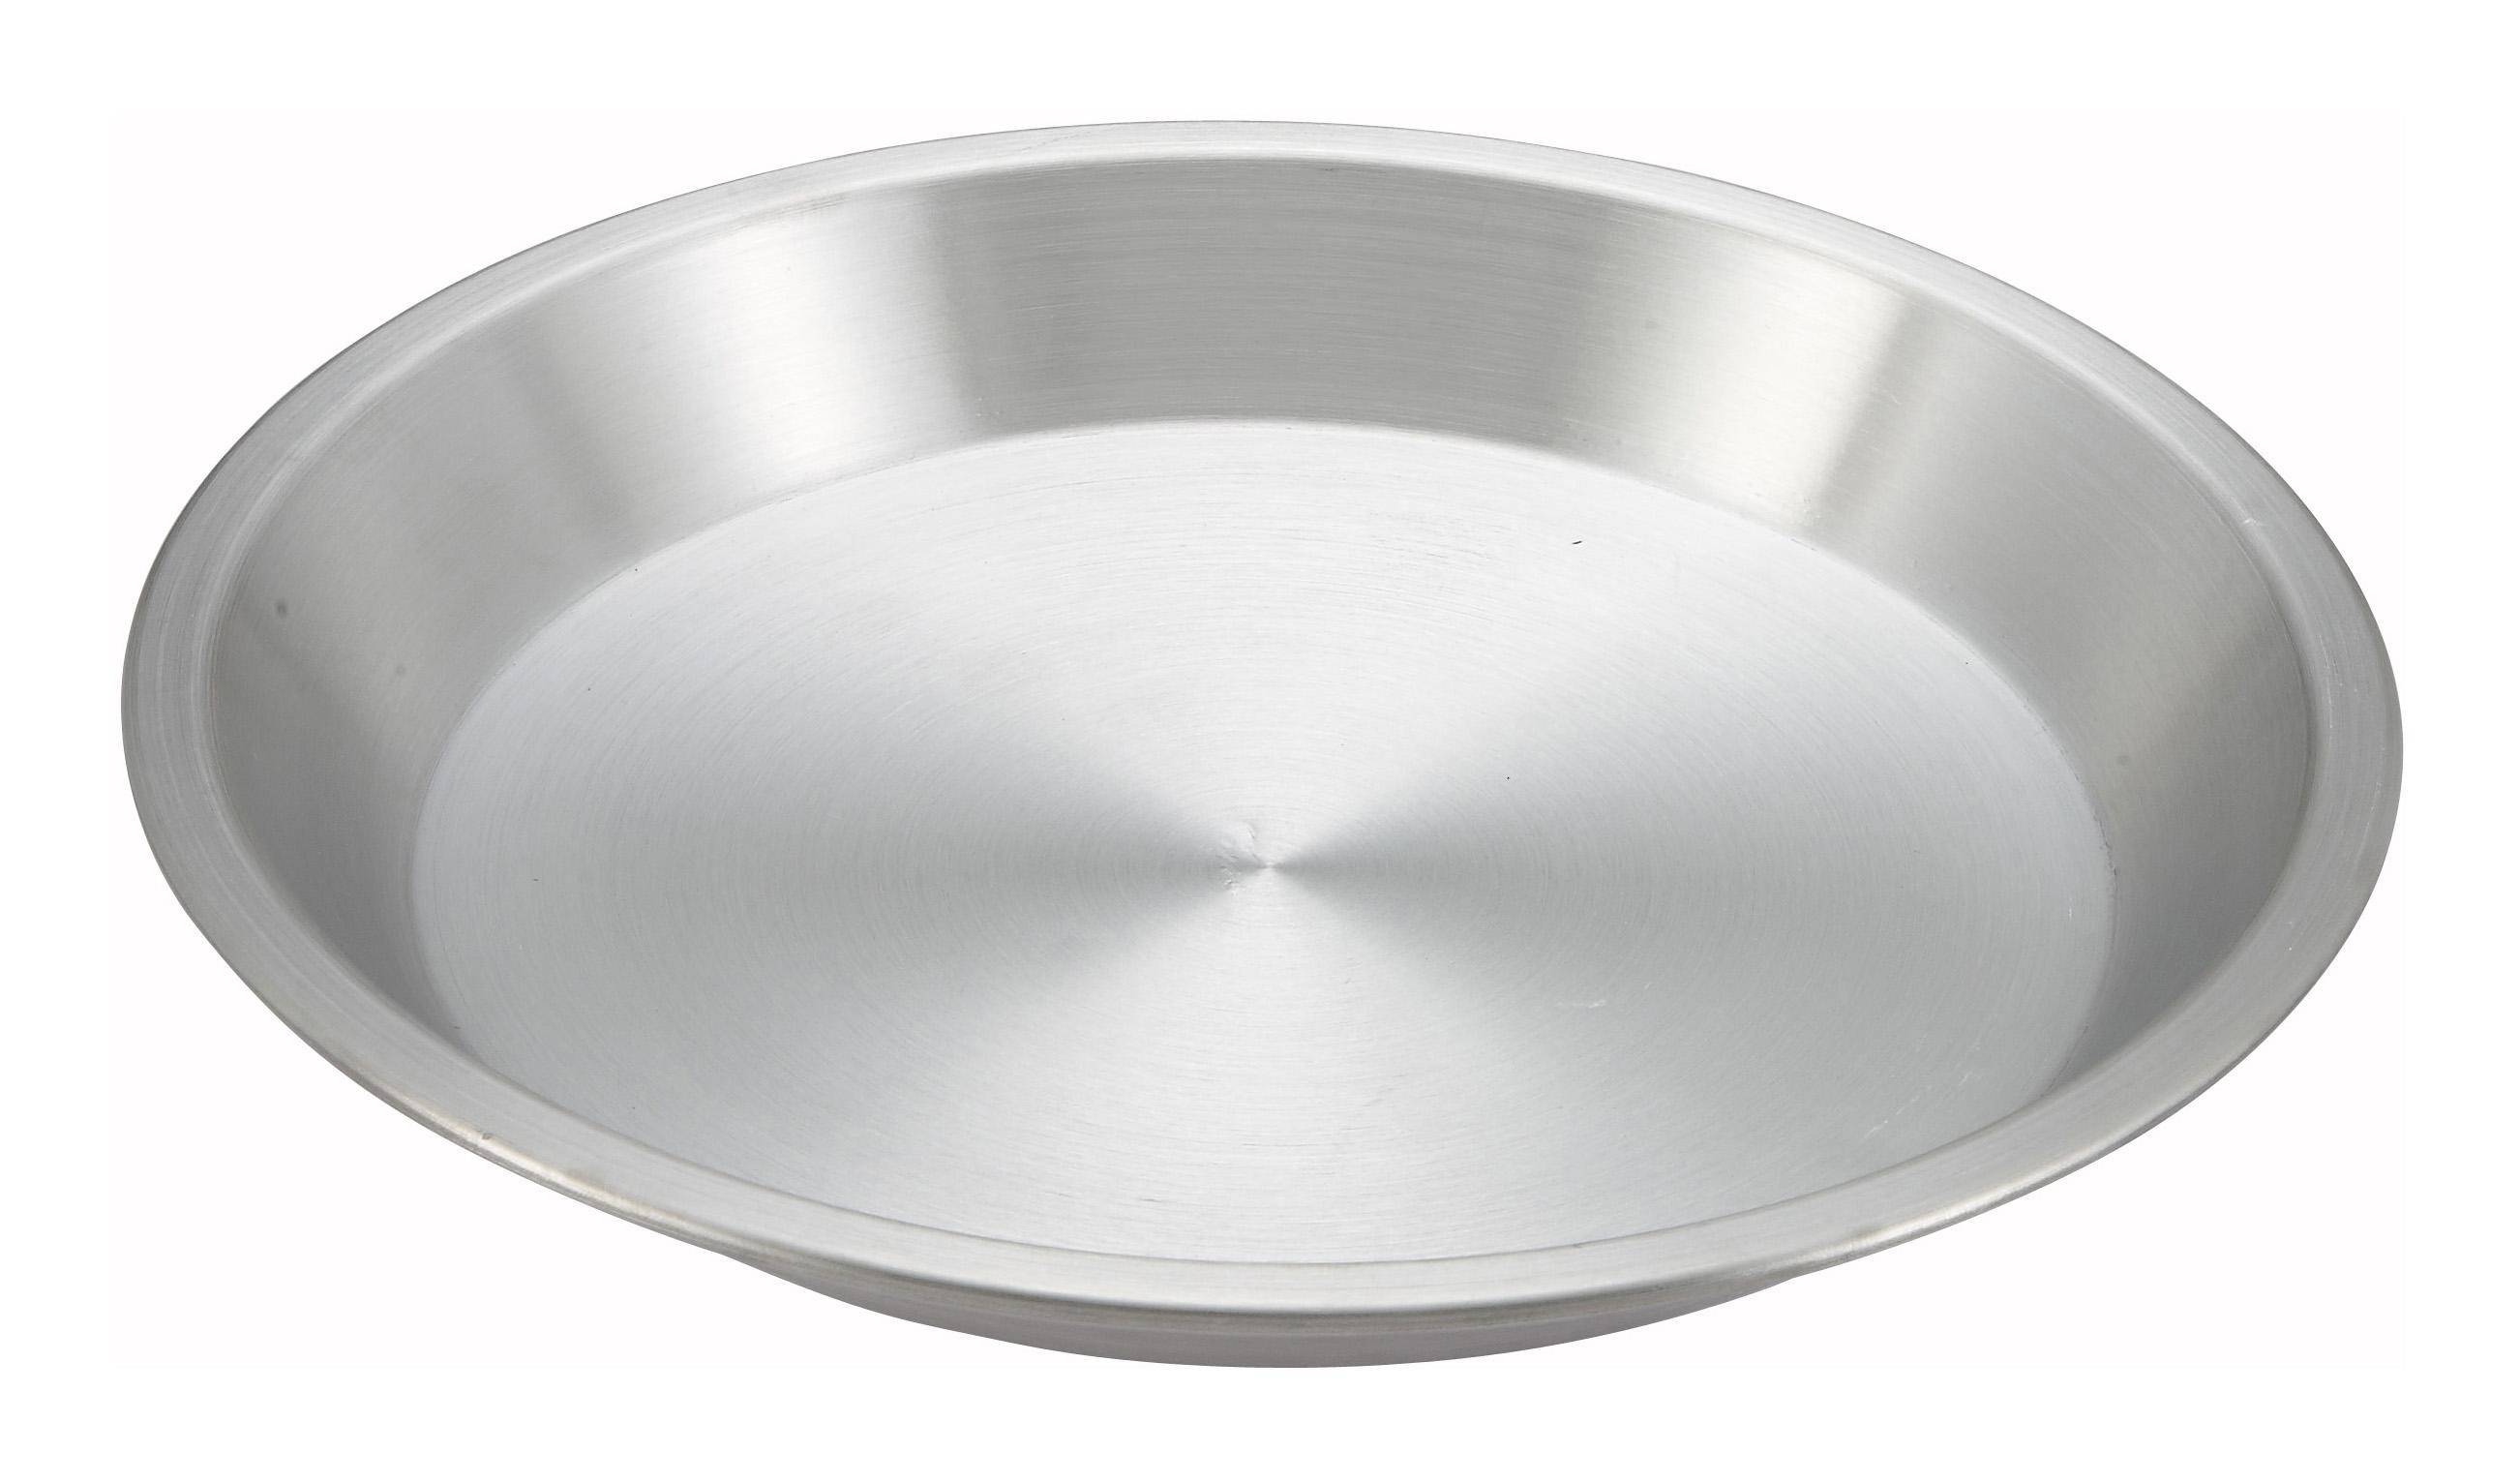 Winco APPL-10 pie plate